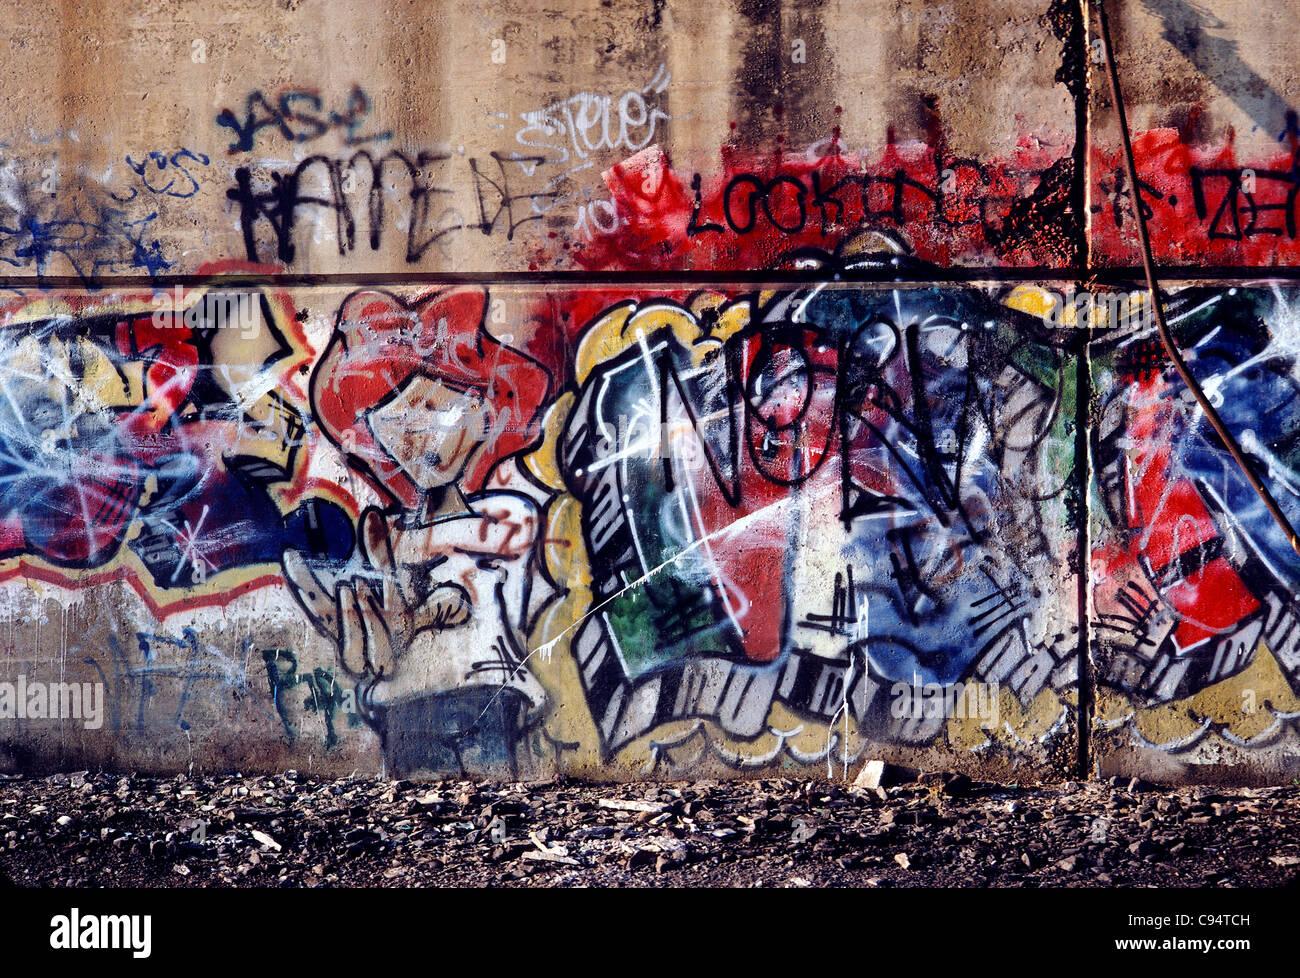 Colorful graffitti art on a concrete wall in Philadelphia, Pennsylvania, USA - Stock Image